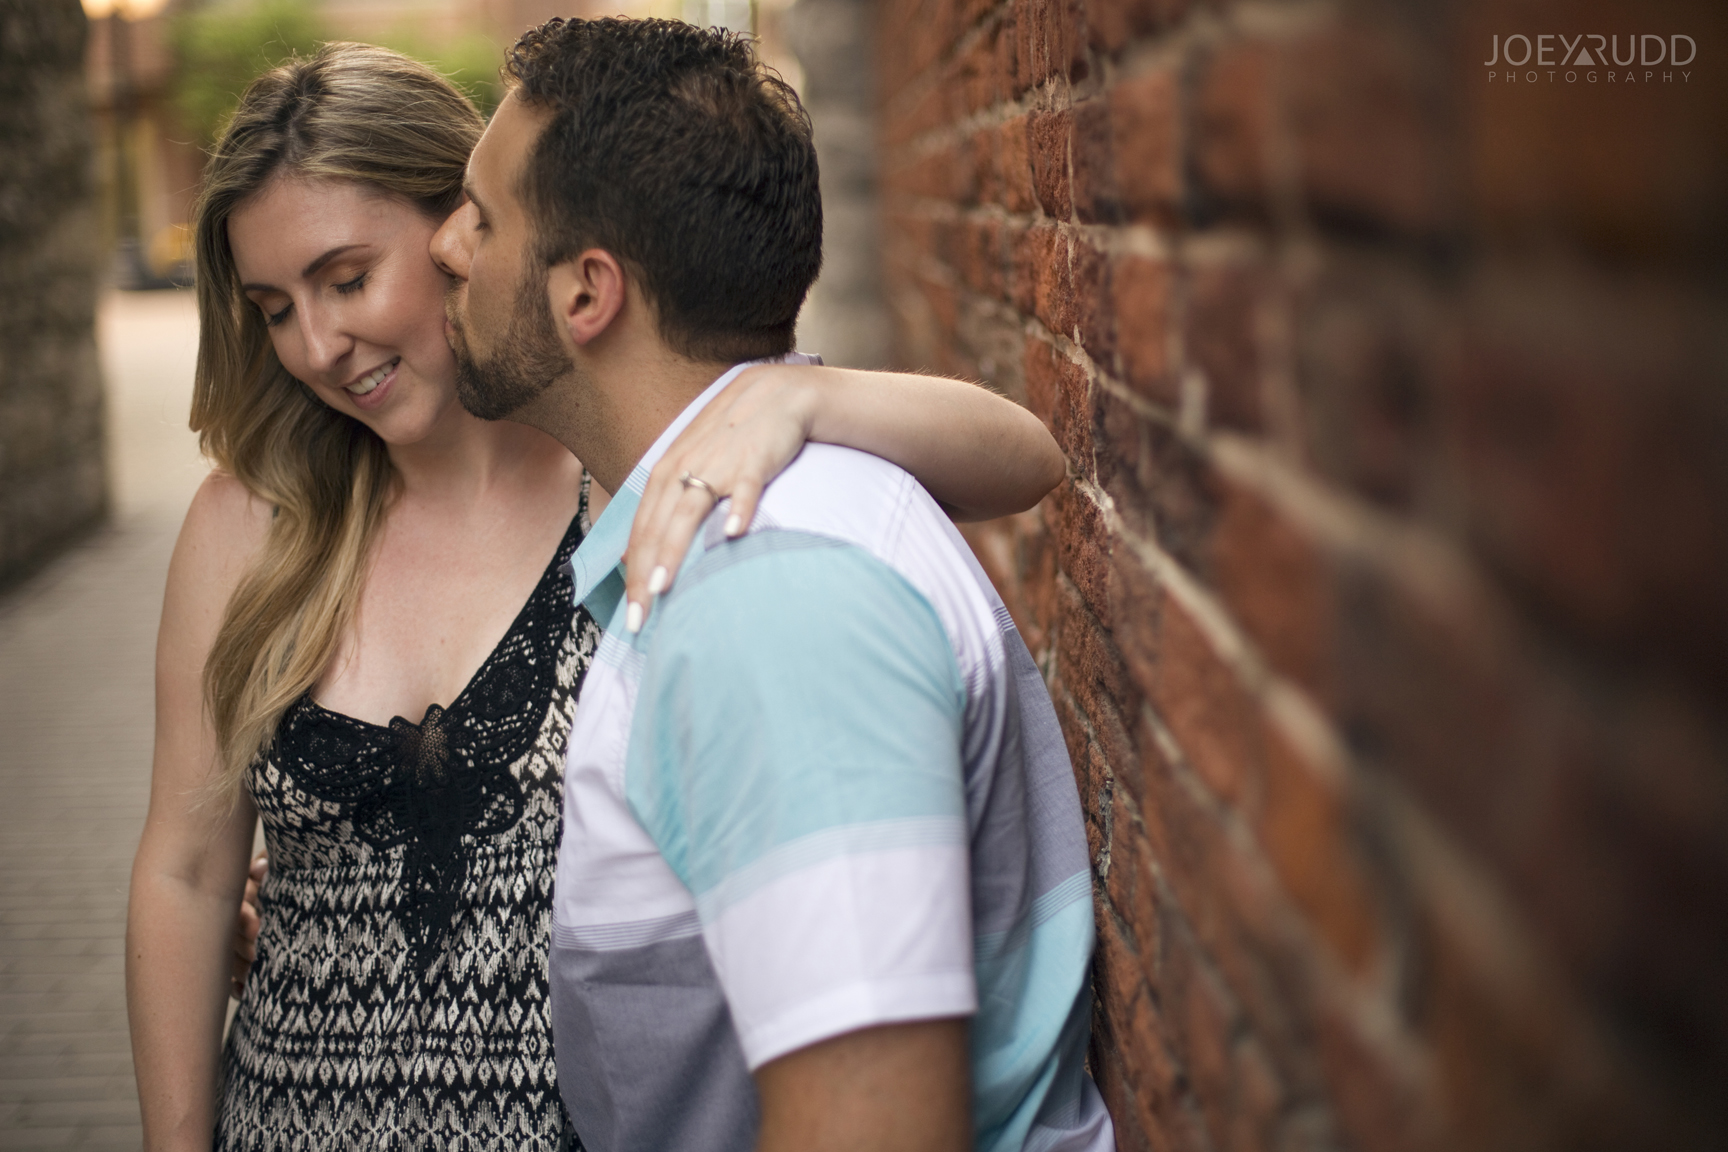 Joey Rudd Photography Ottawa Wedding Photographer Engagement Bricks